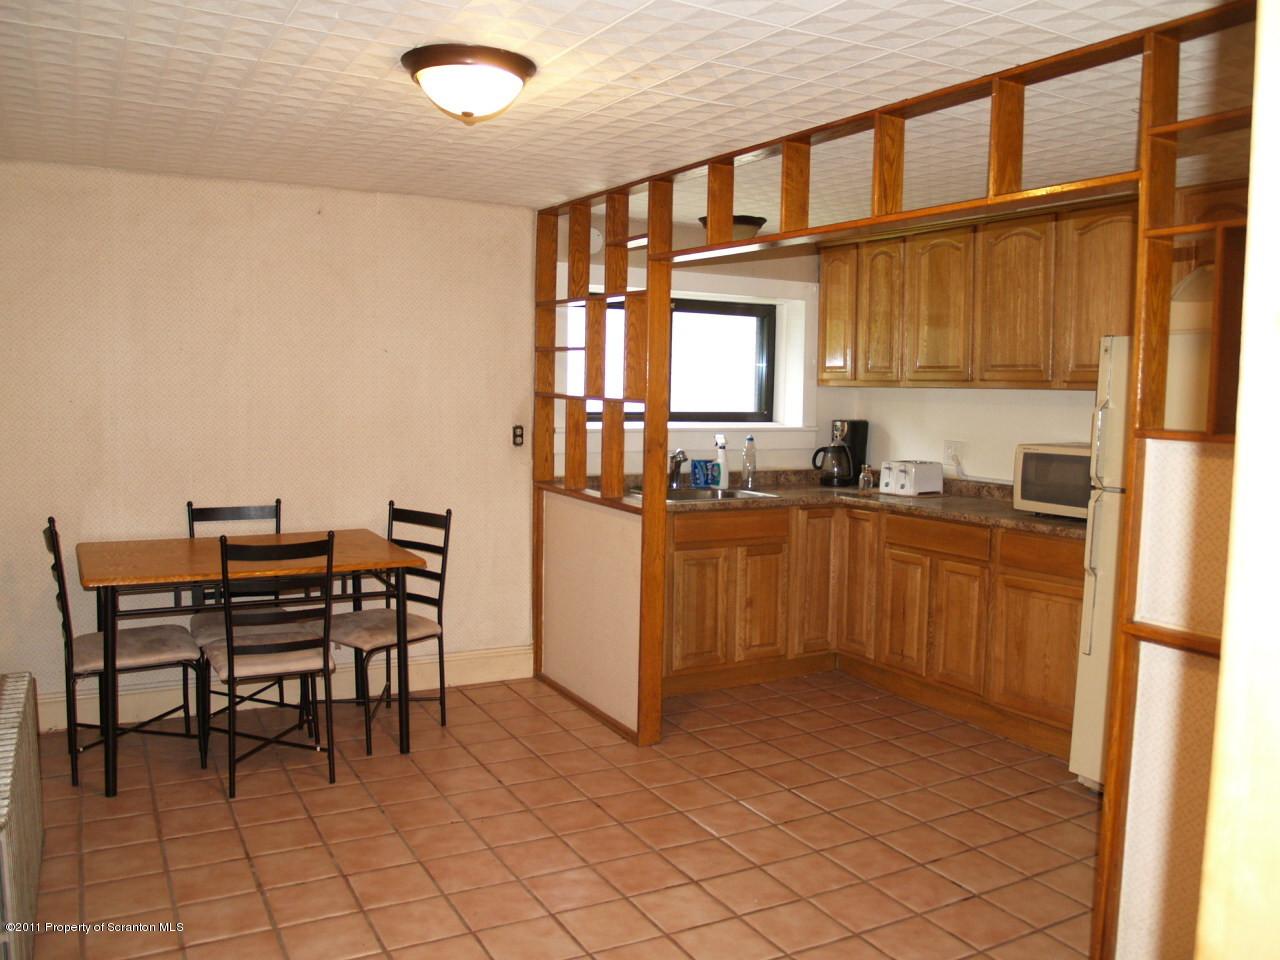 1375 Lake Ariel Hwy, Lake Ariel, Pennsylvania 18436, ,1.5 BathroomsBathrooms,Commercial,For Sale,Lake Ariel,12-3736